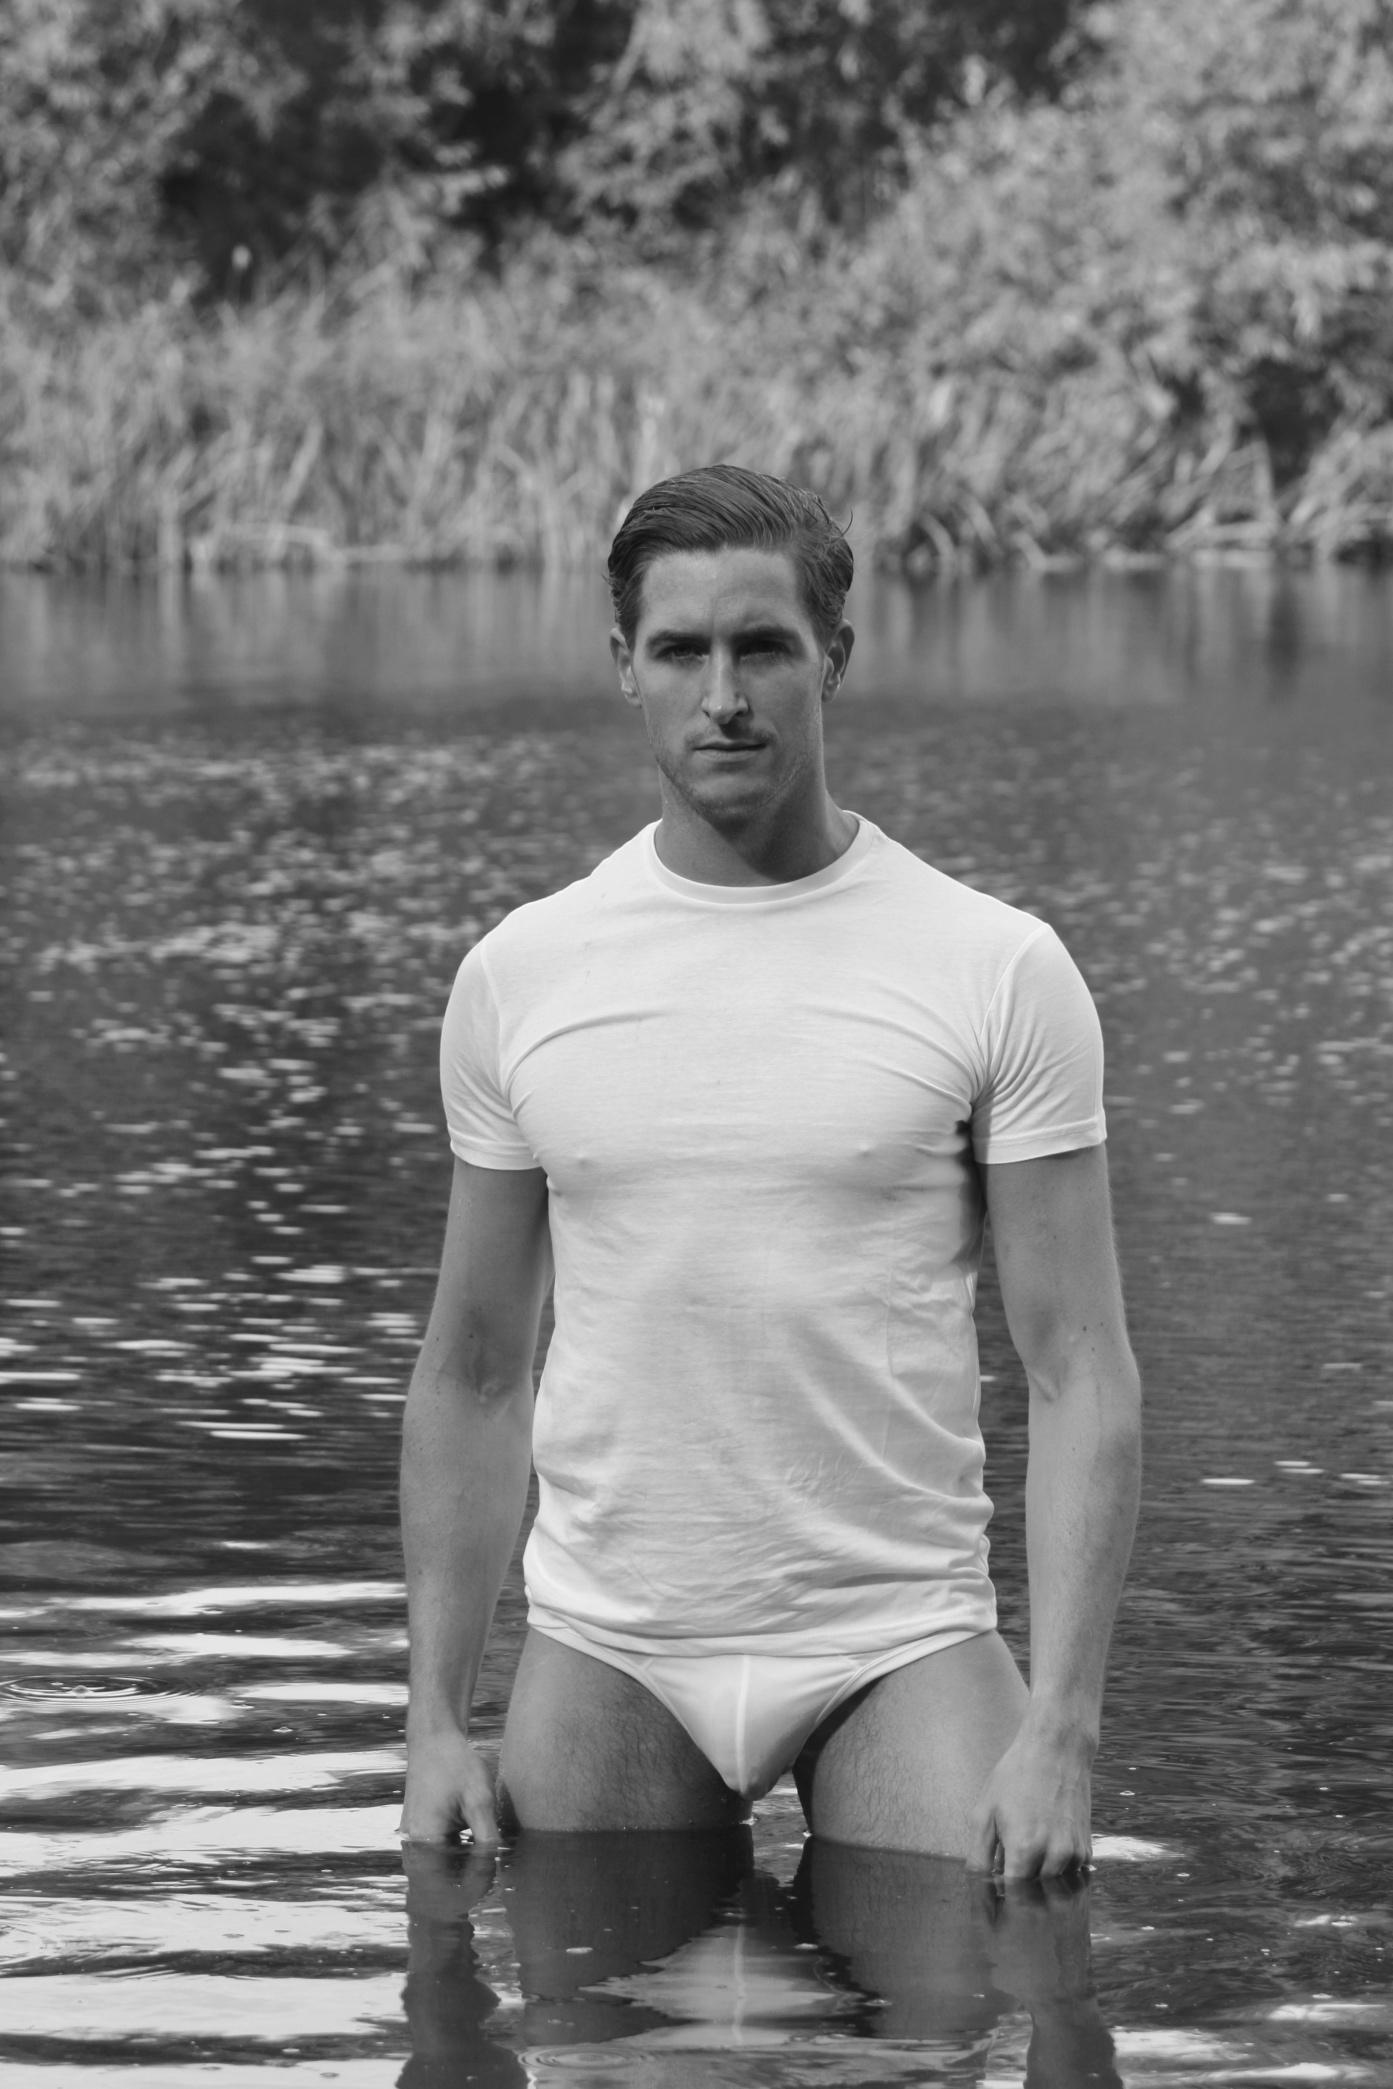 Paul Smollen Shoot featuring Lake Shoot feat Danny